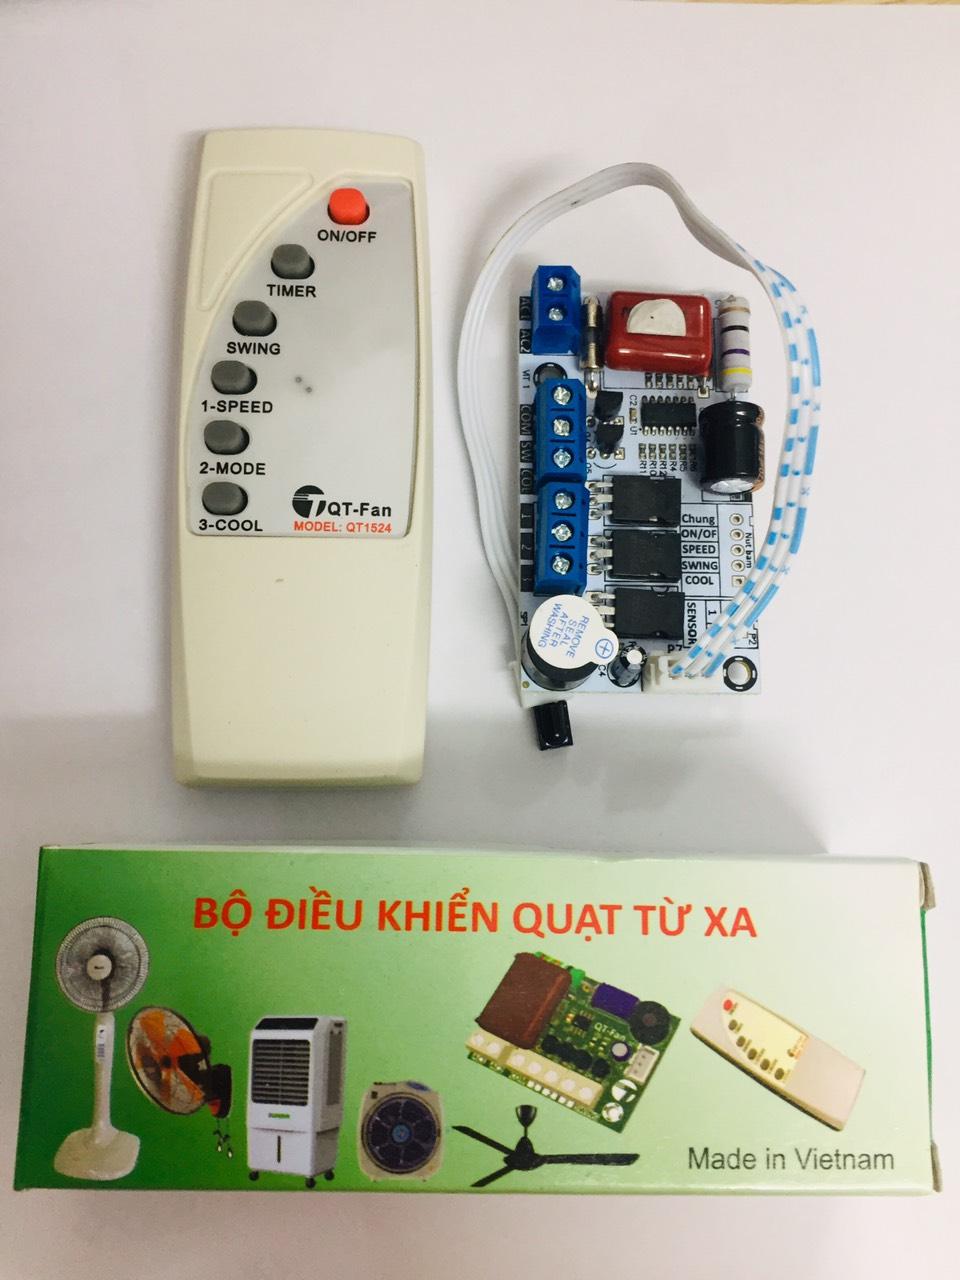 bo-dieu-khien-quat-tu-bo-dieu-khien-quat-tu-xa-qt-311